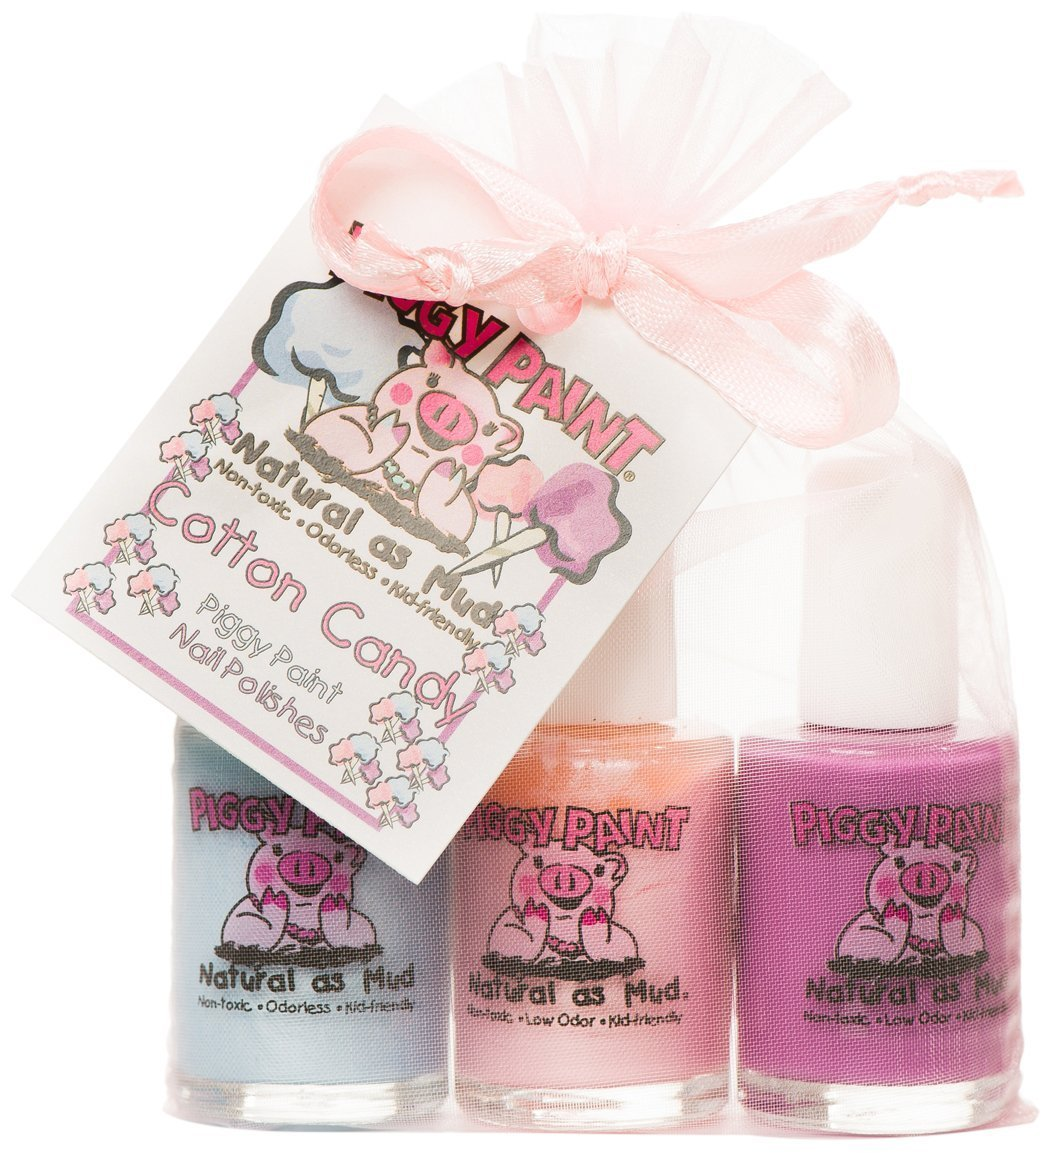 Amazon Com Smitco Llc Kids Nail Polish: Amazon.com : Piggy Paint Nail Polish Gift Set, Little